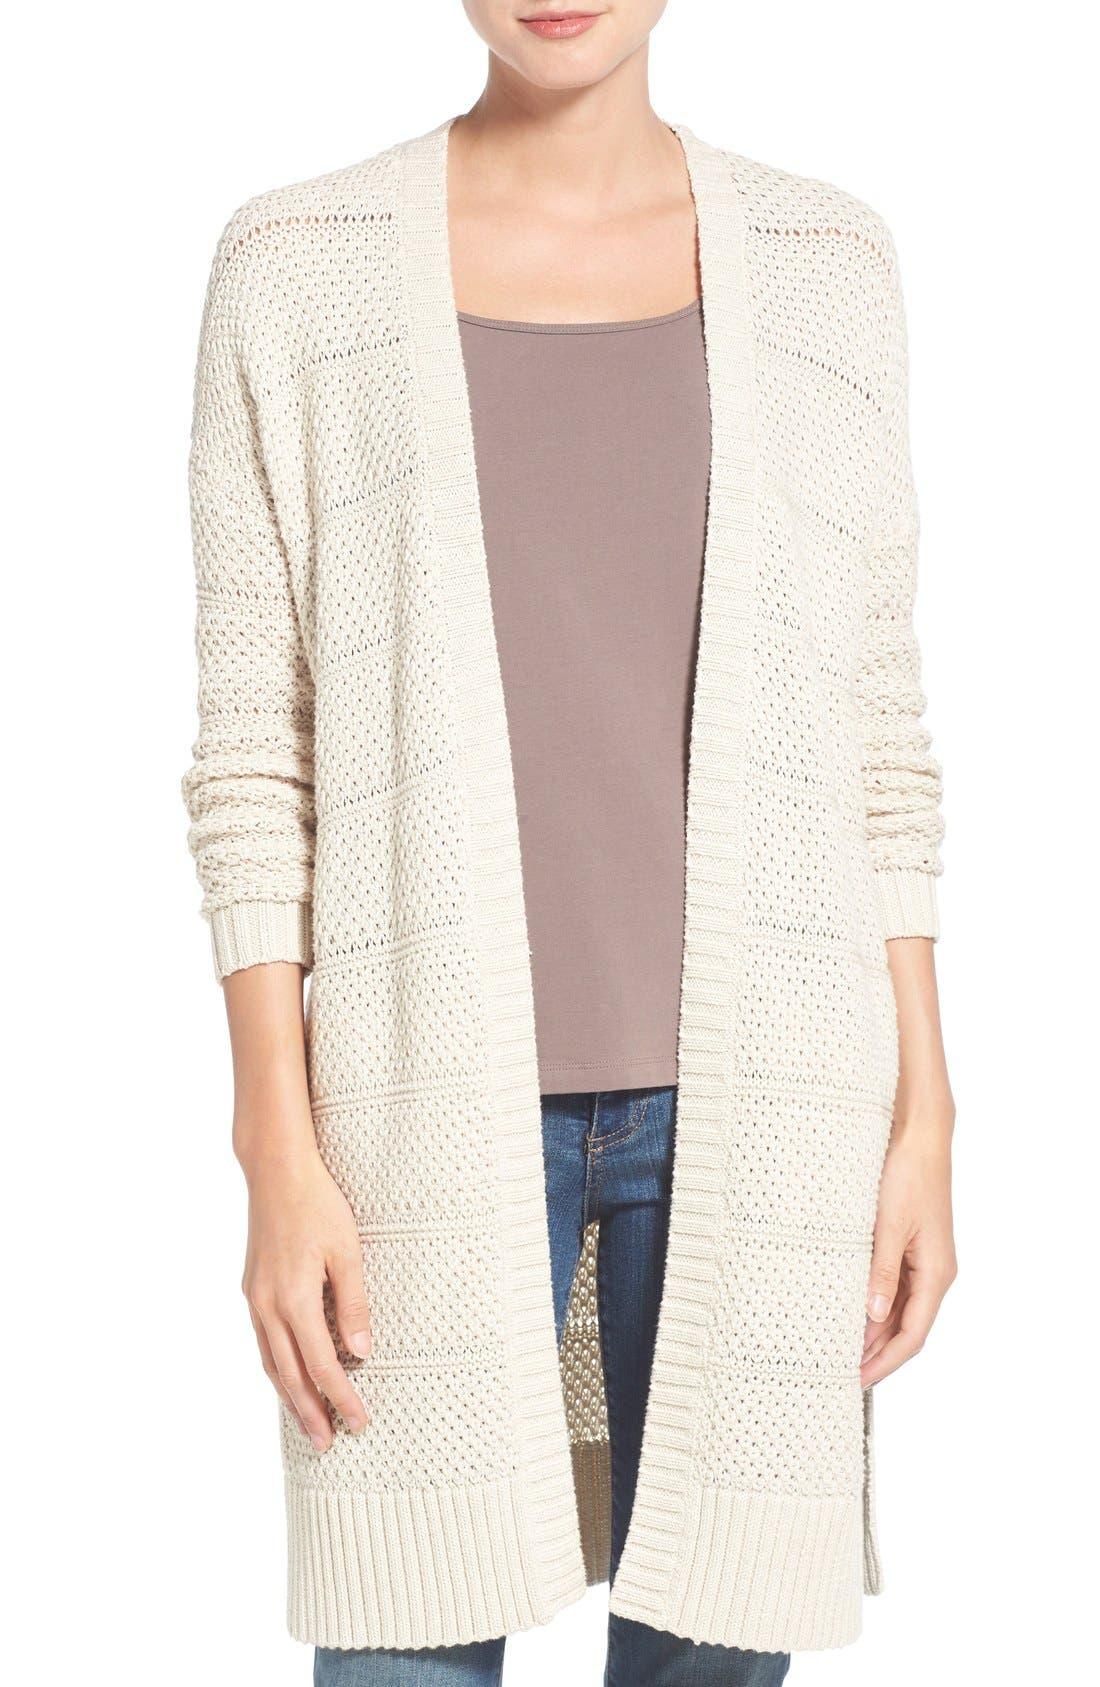 Alternate Image 1 Selected - Caslon® Open Stitch Long Cotton Cardigan (Regular & Petite)